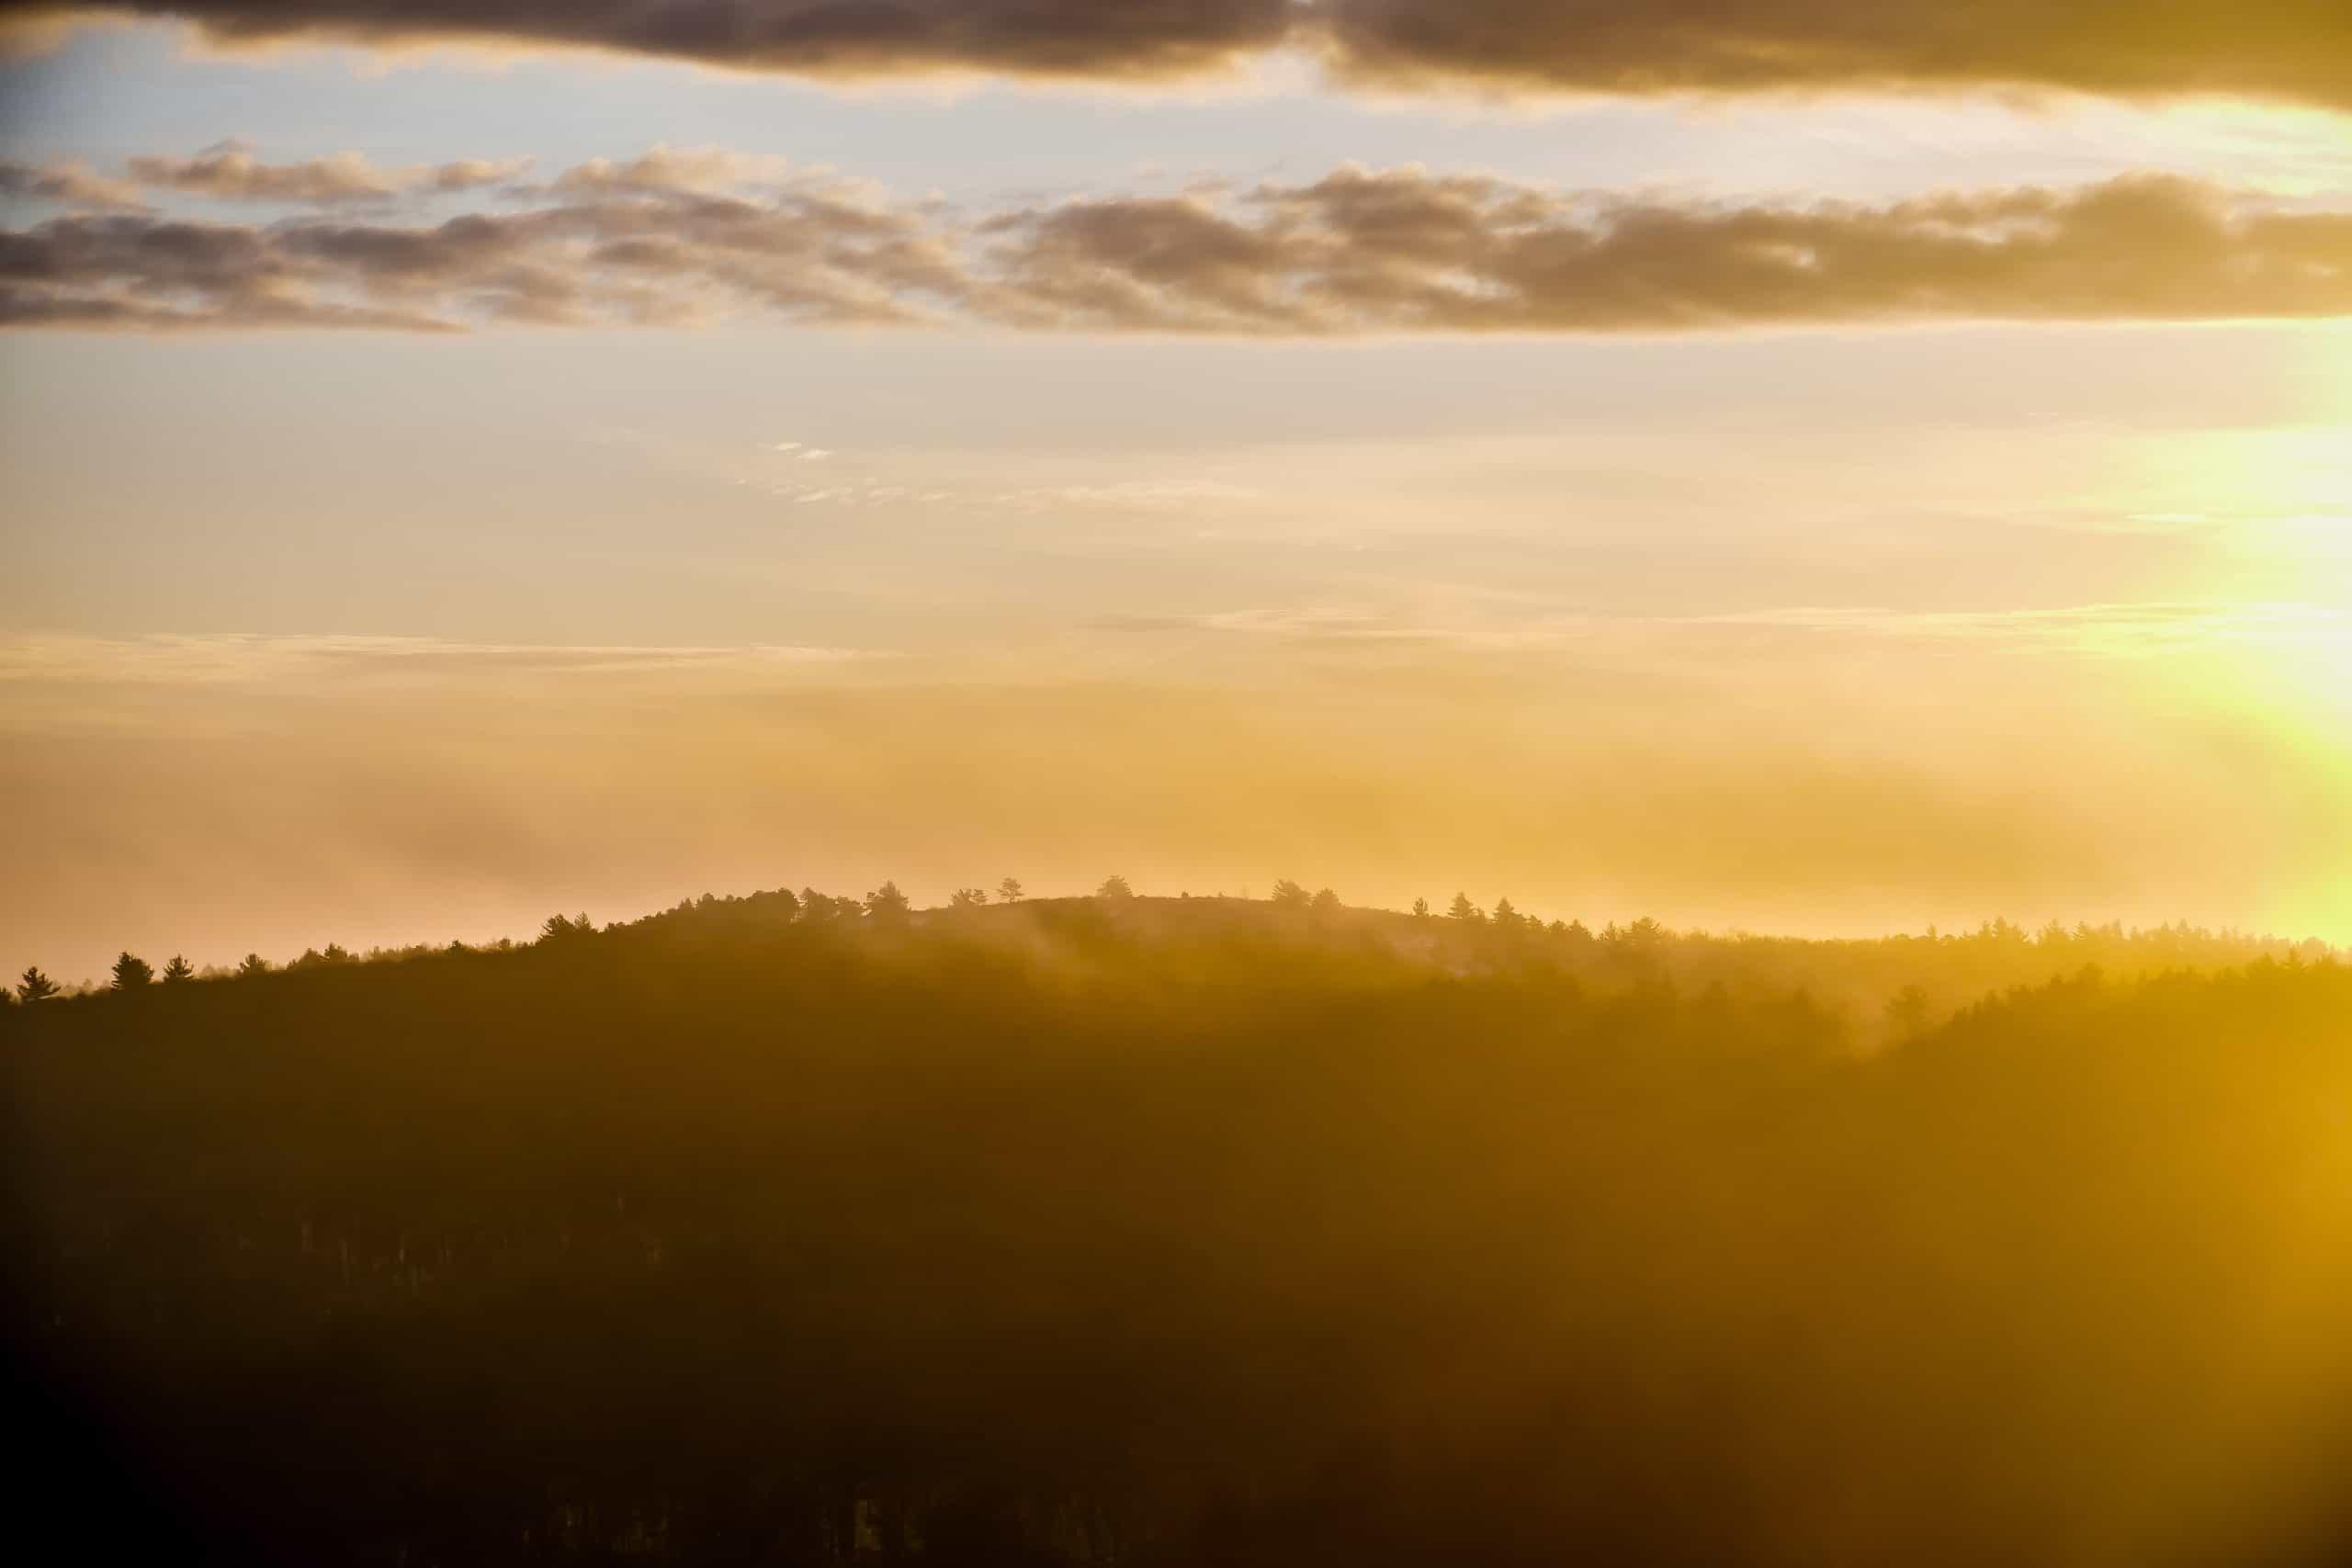 sunrise at hancock hill